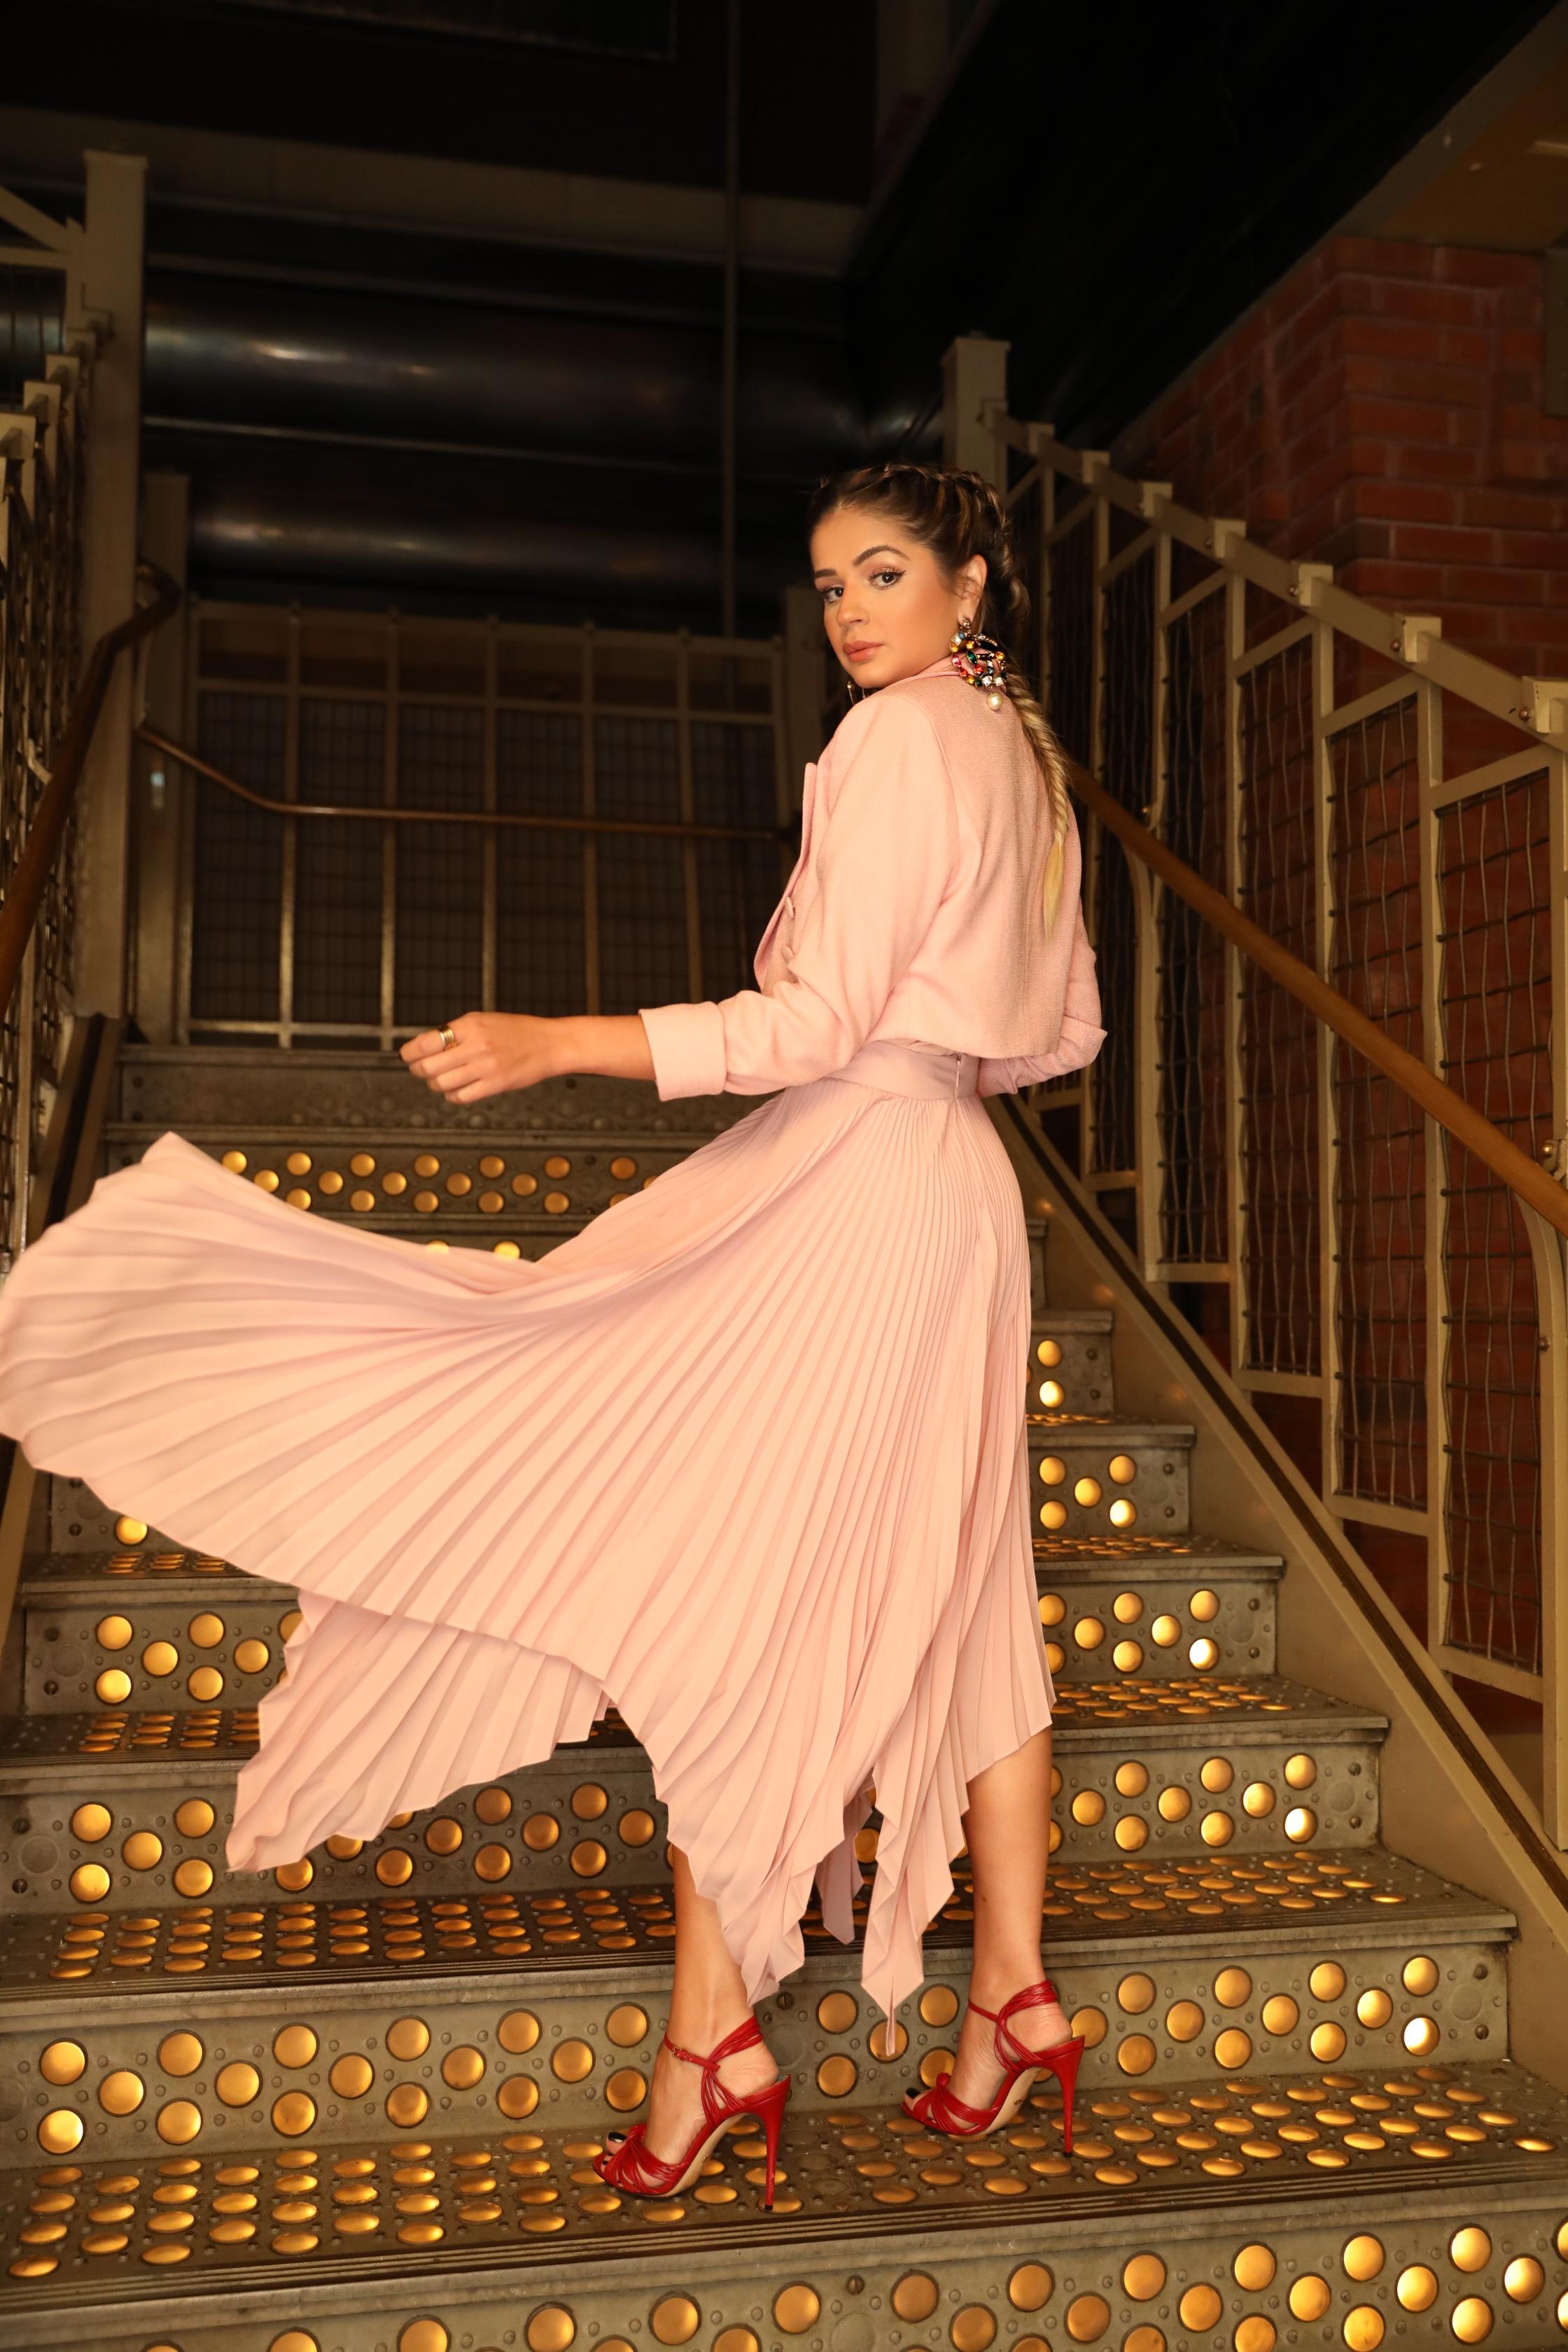 Thassia de rosa iorane NY